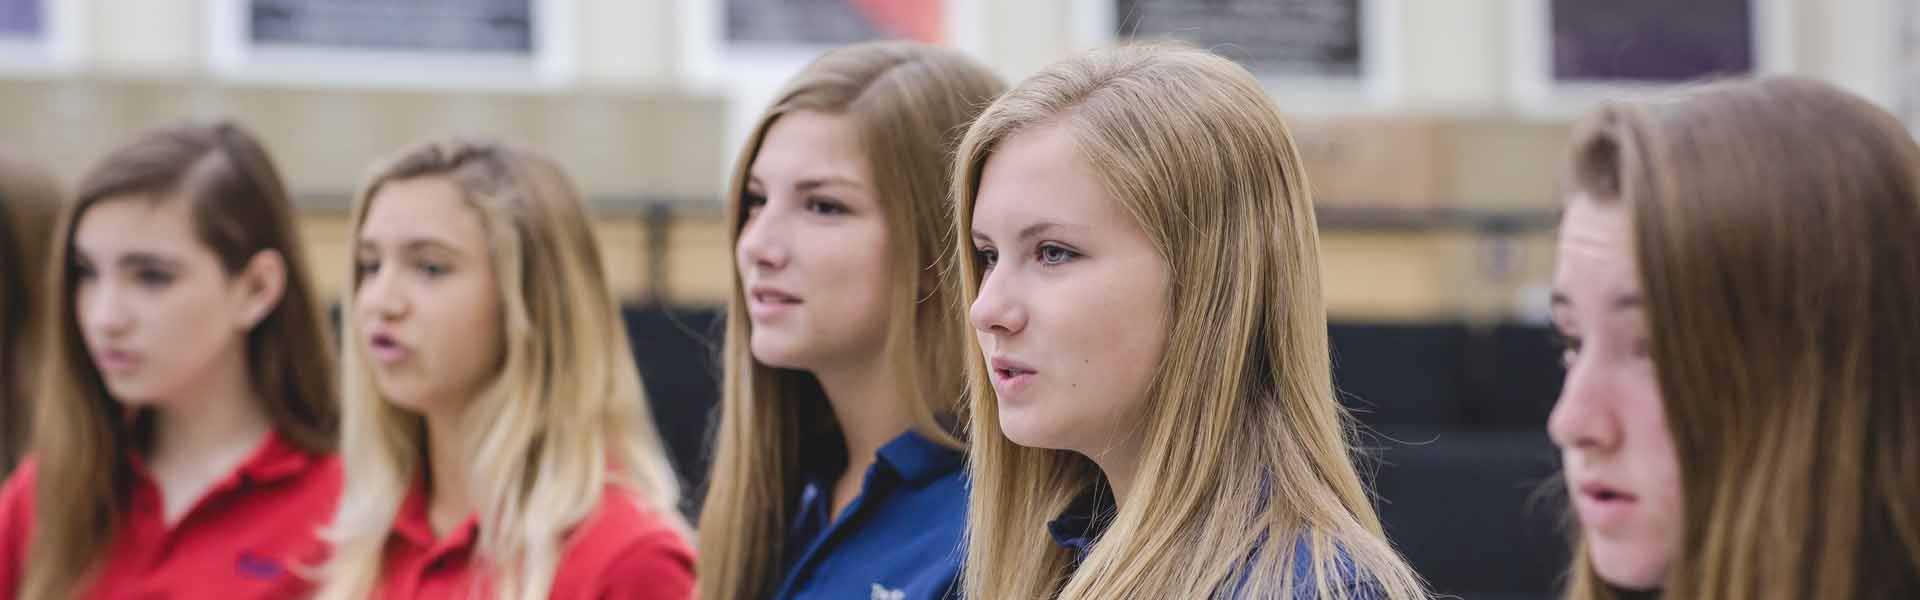 Kingsacademy-highschool-FL-Girls-MAin-Banner